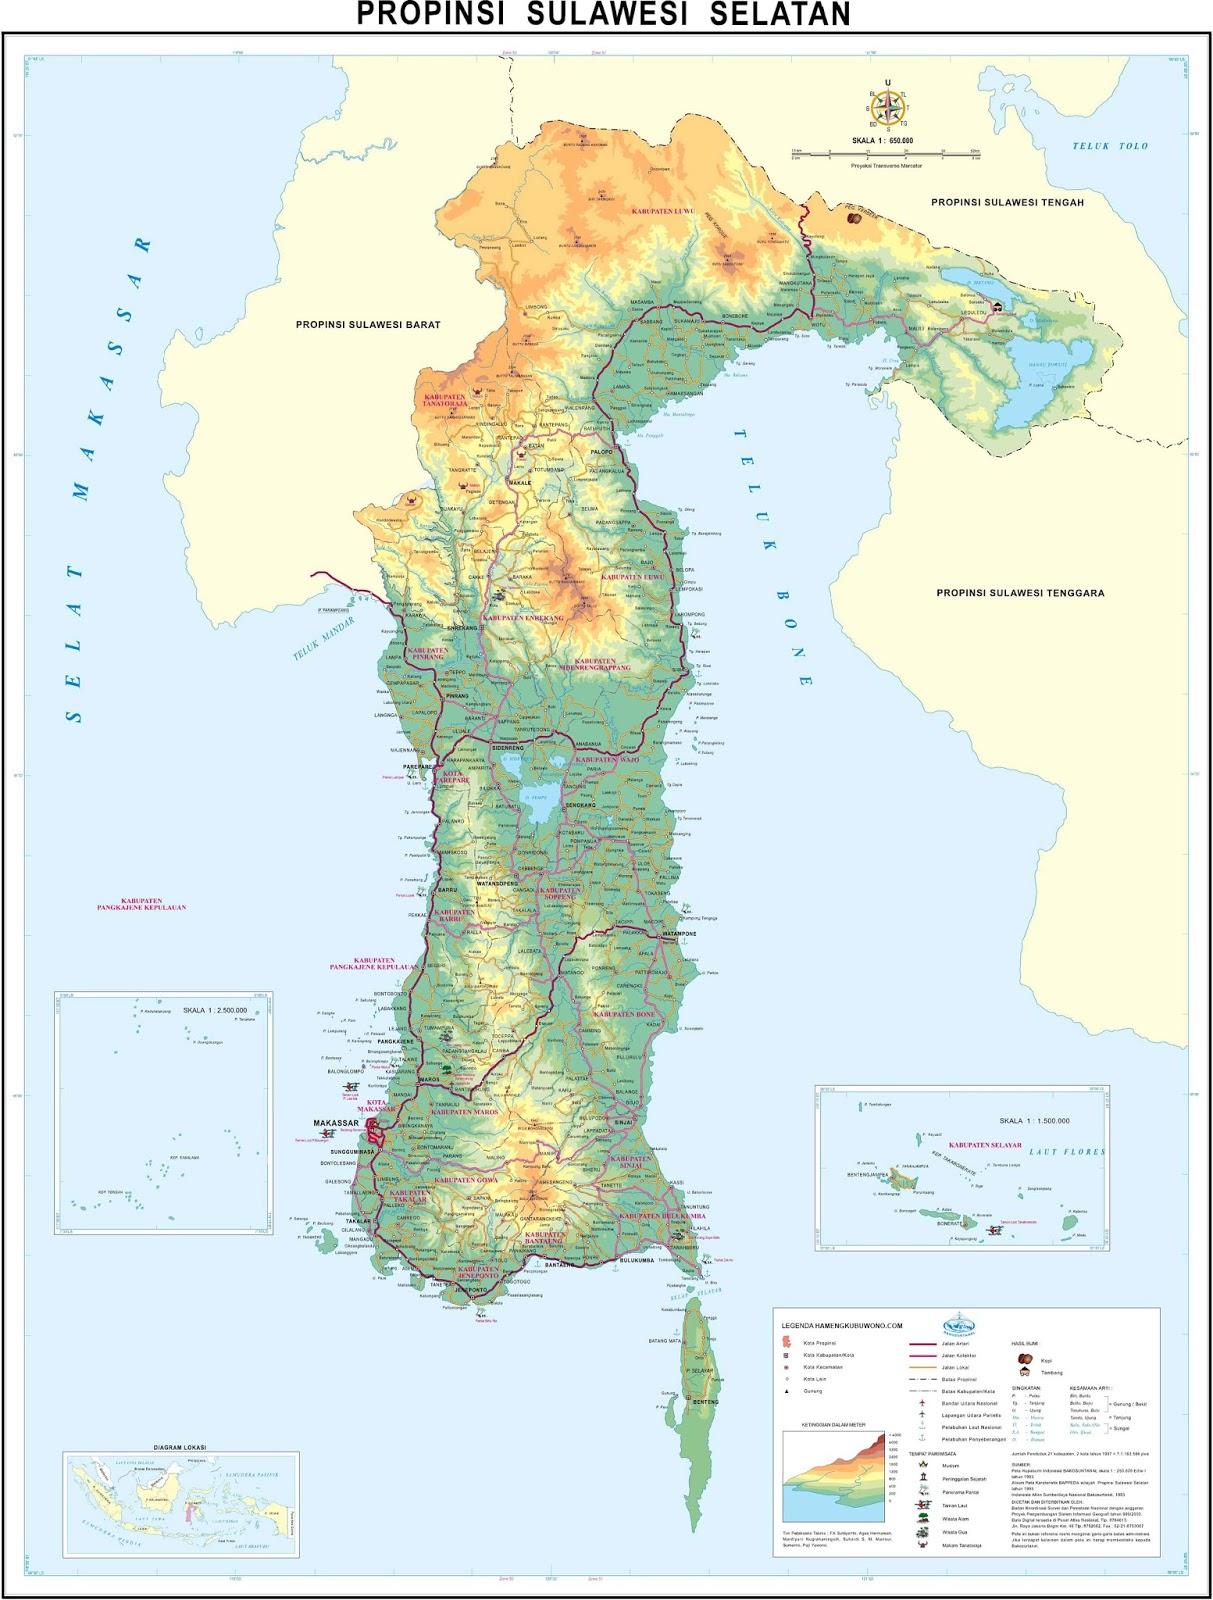 Download Peta Sulawesi Selatan